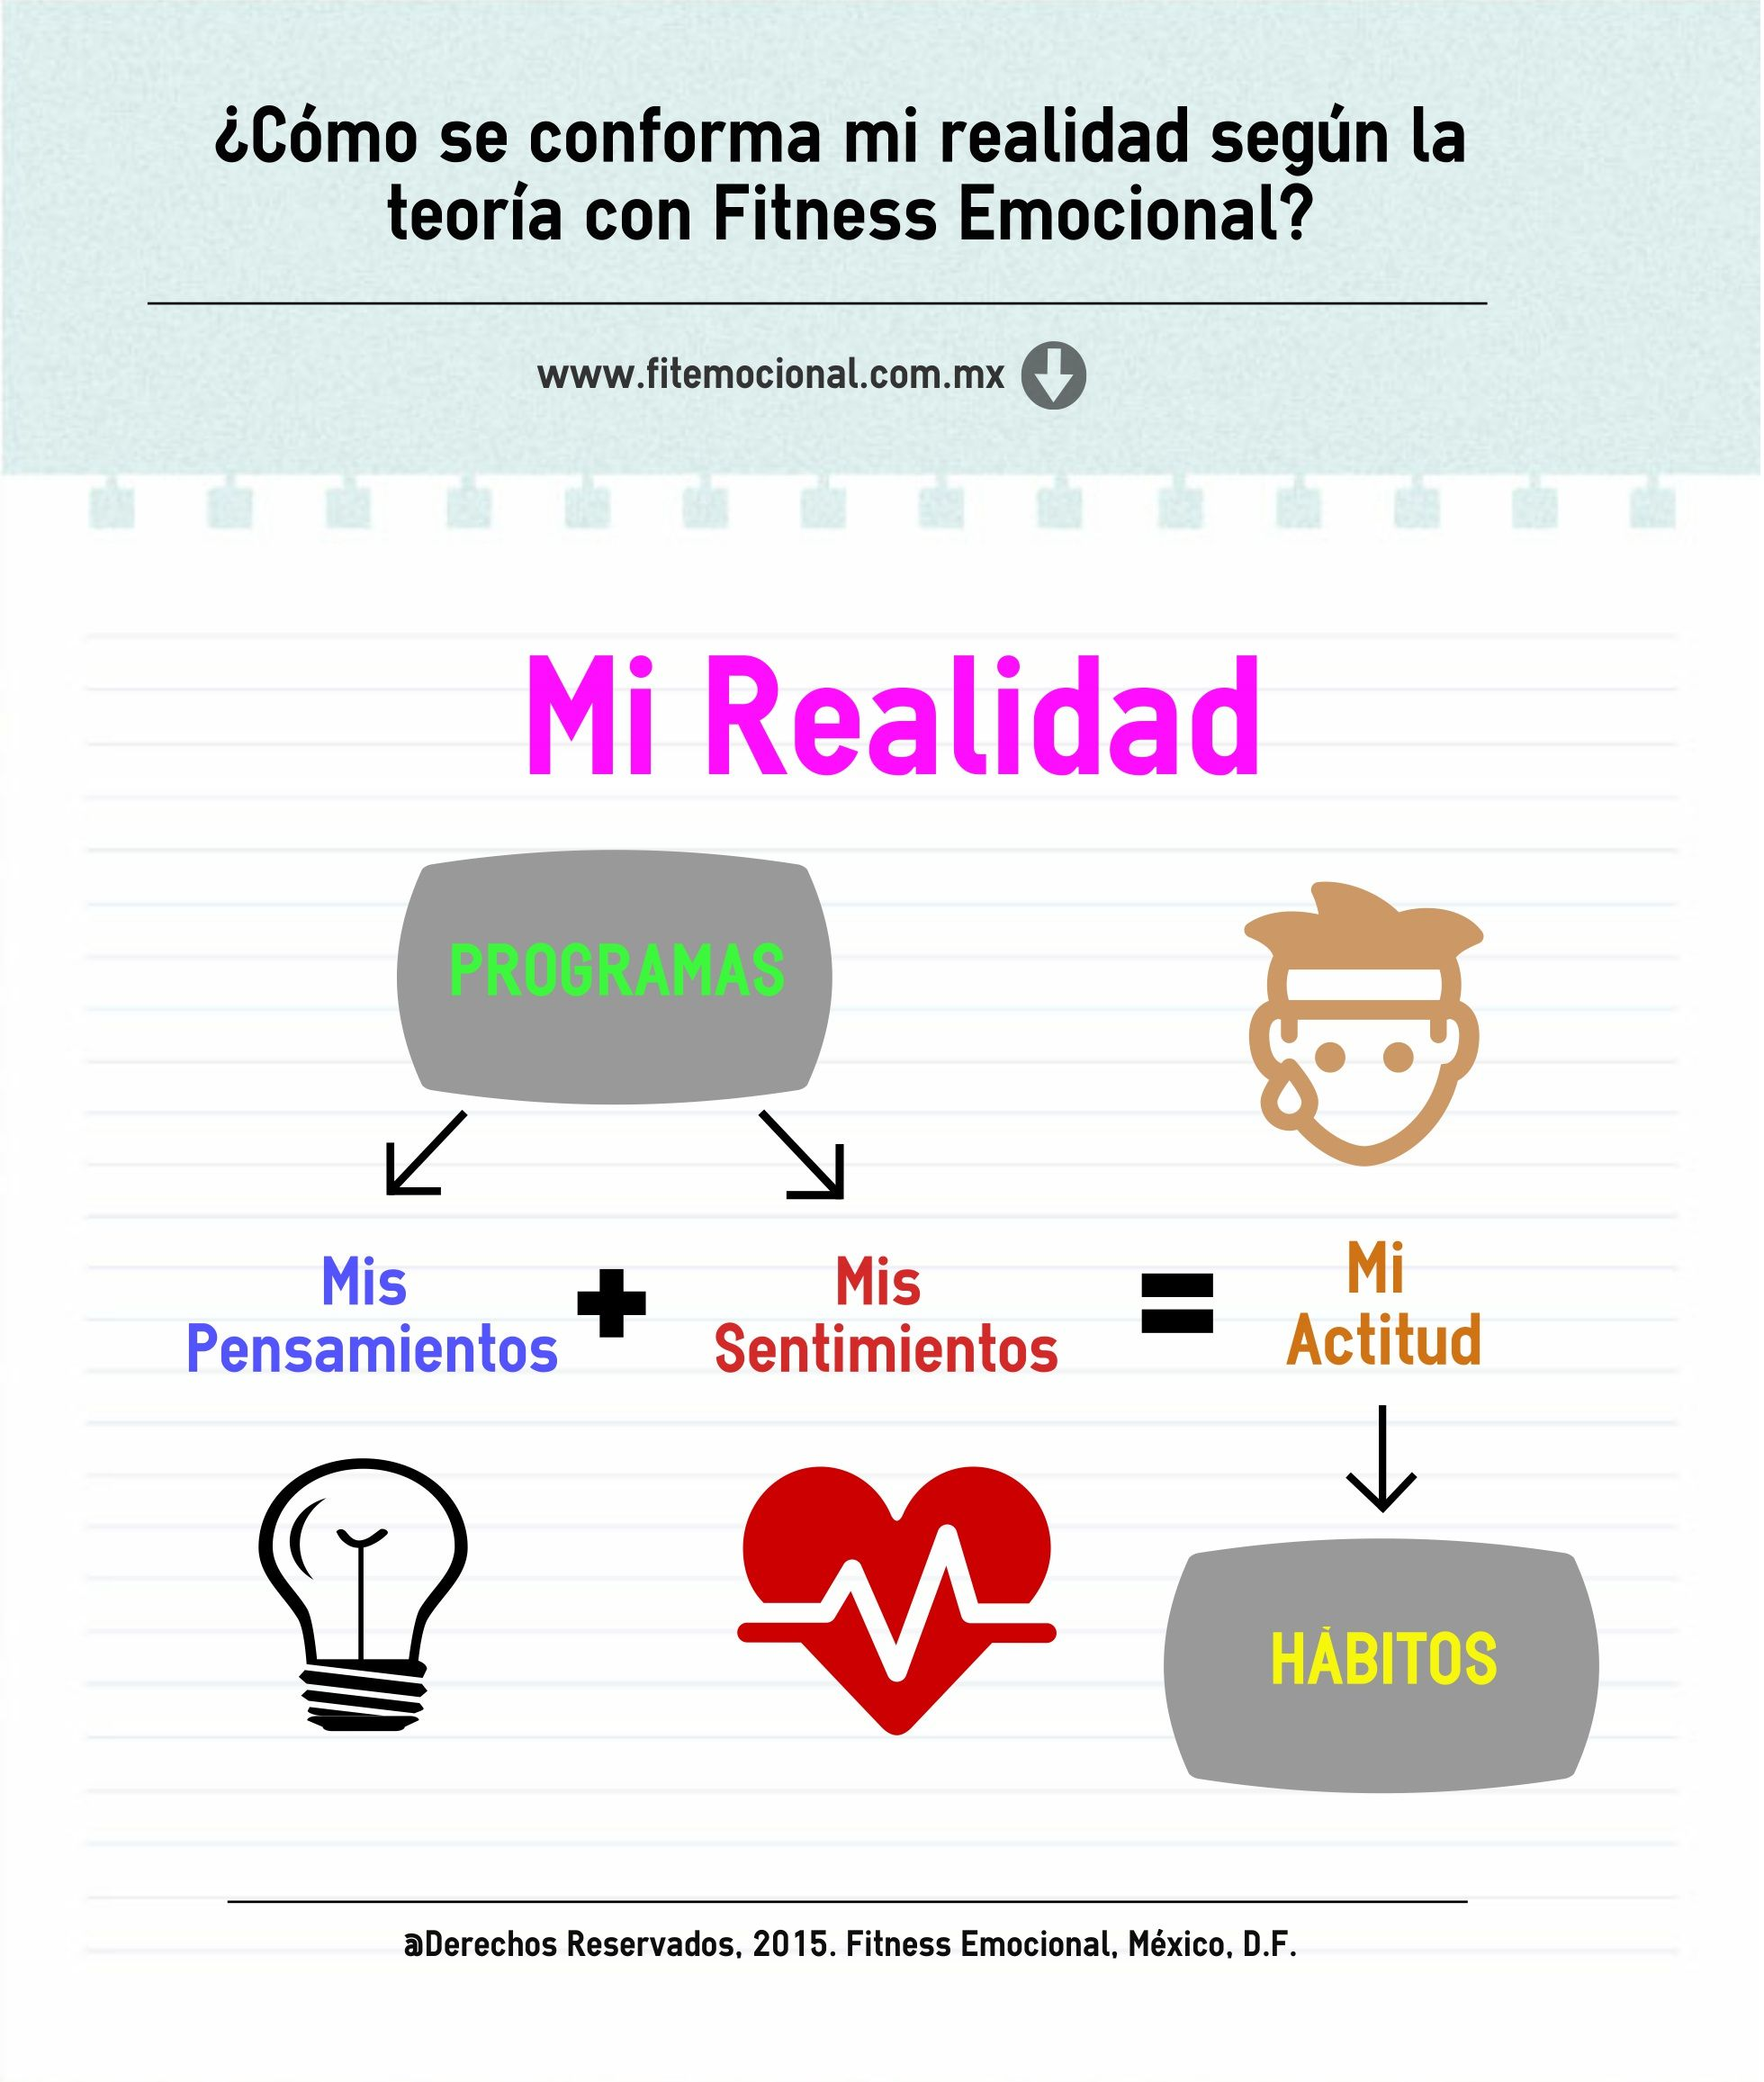 Fitness Emocional, FitEmocional, Coaching Emocional